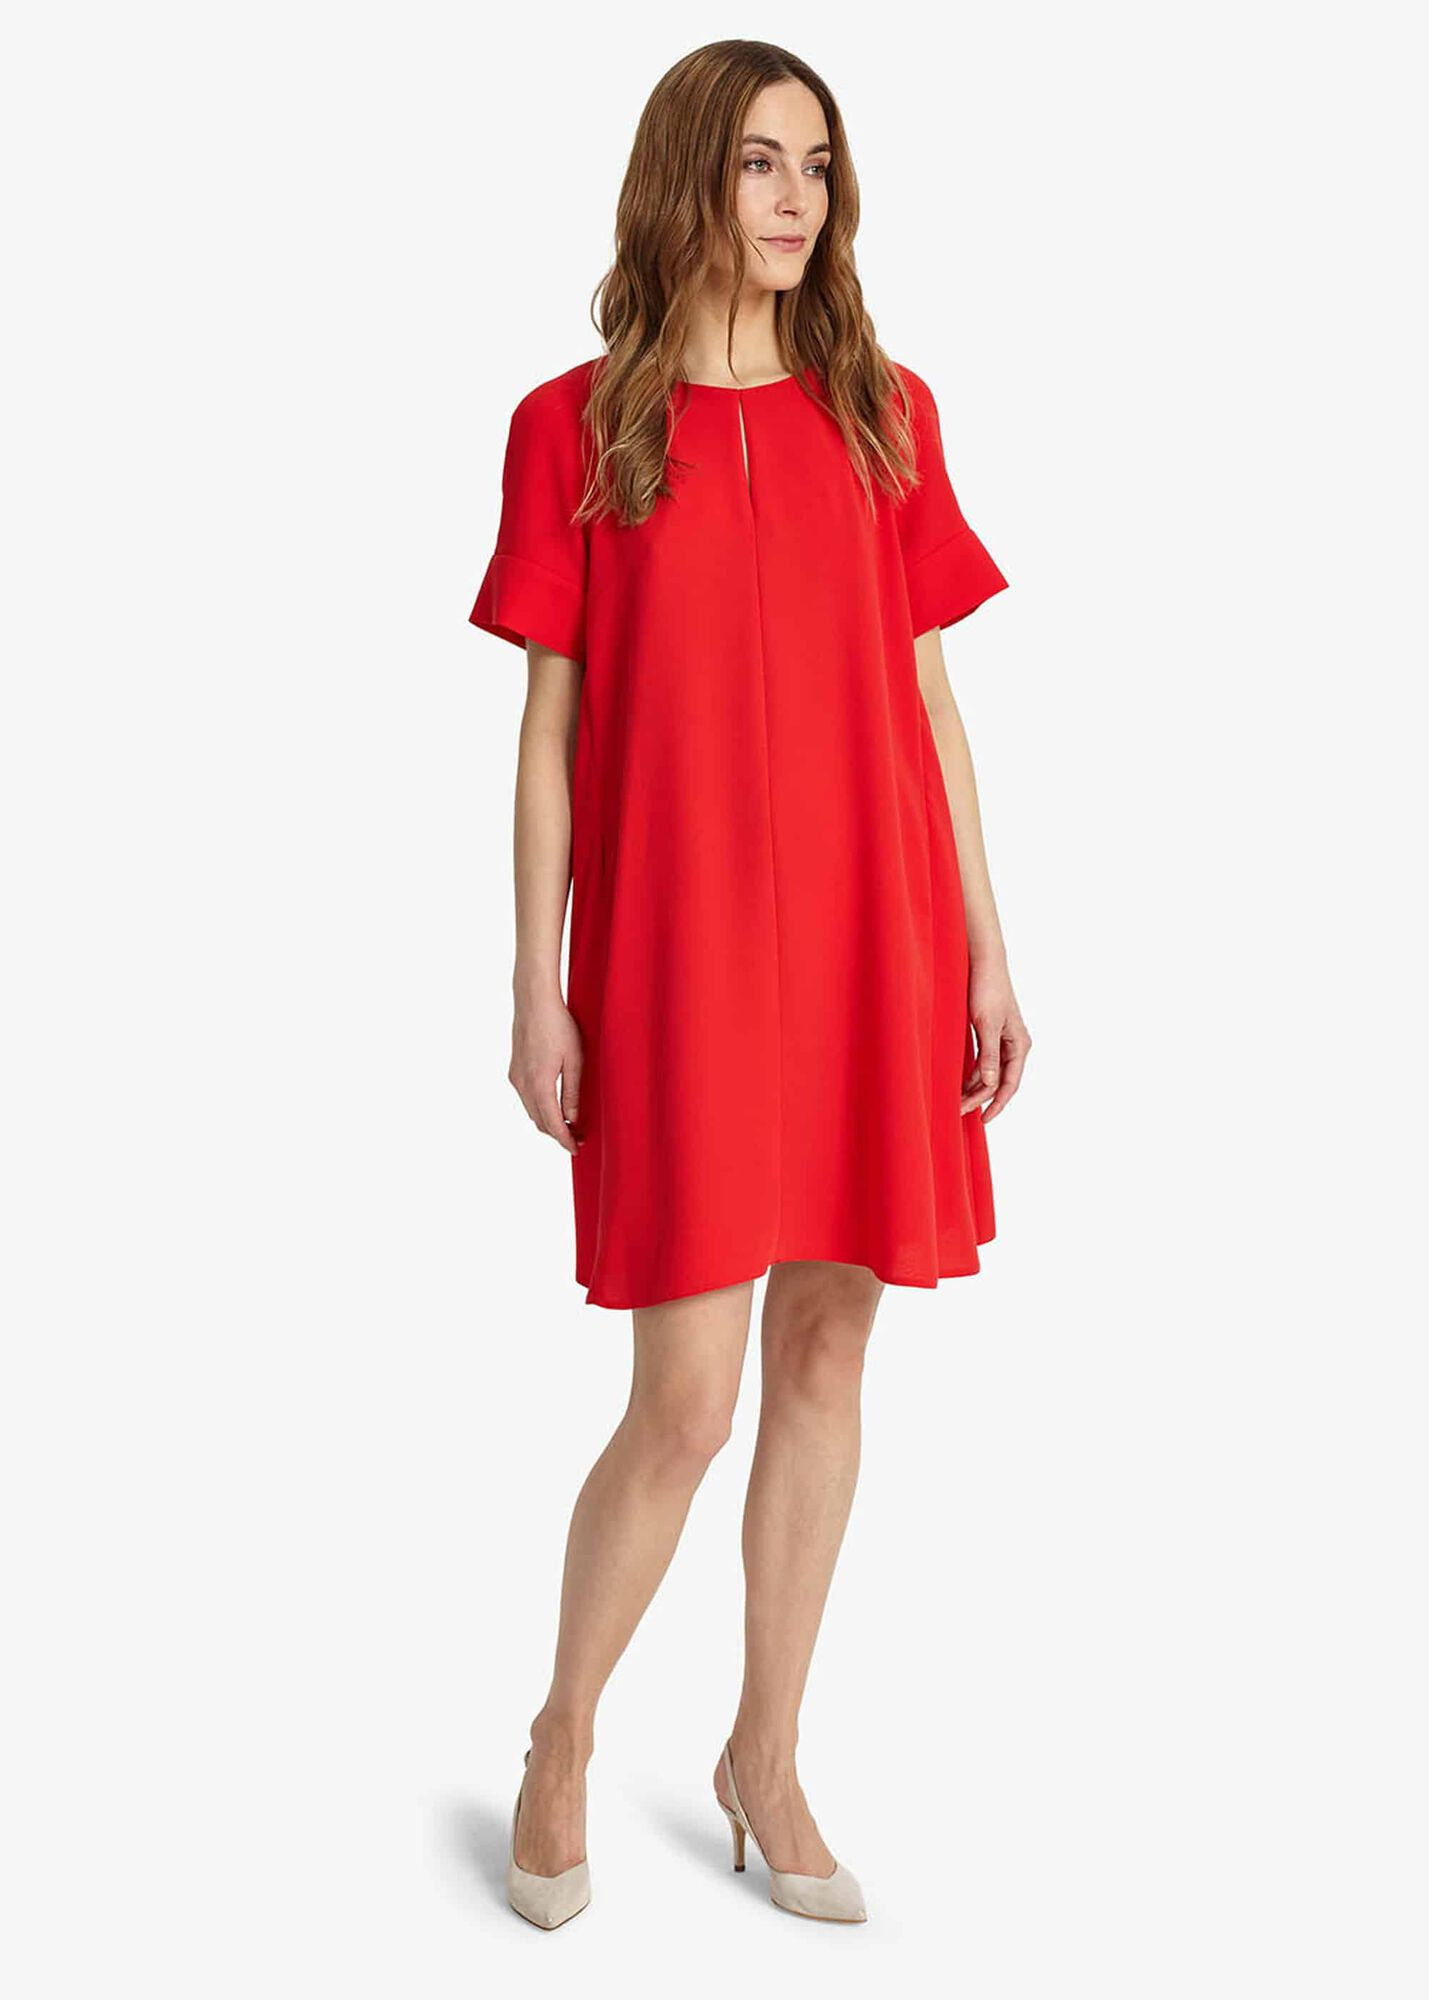 ae54dfbc8447 Zoe Swing Dress. Previous Next. Phase Eight